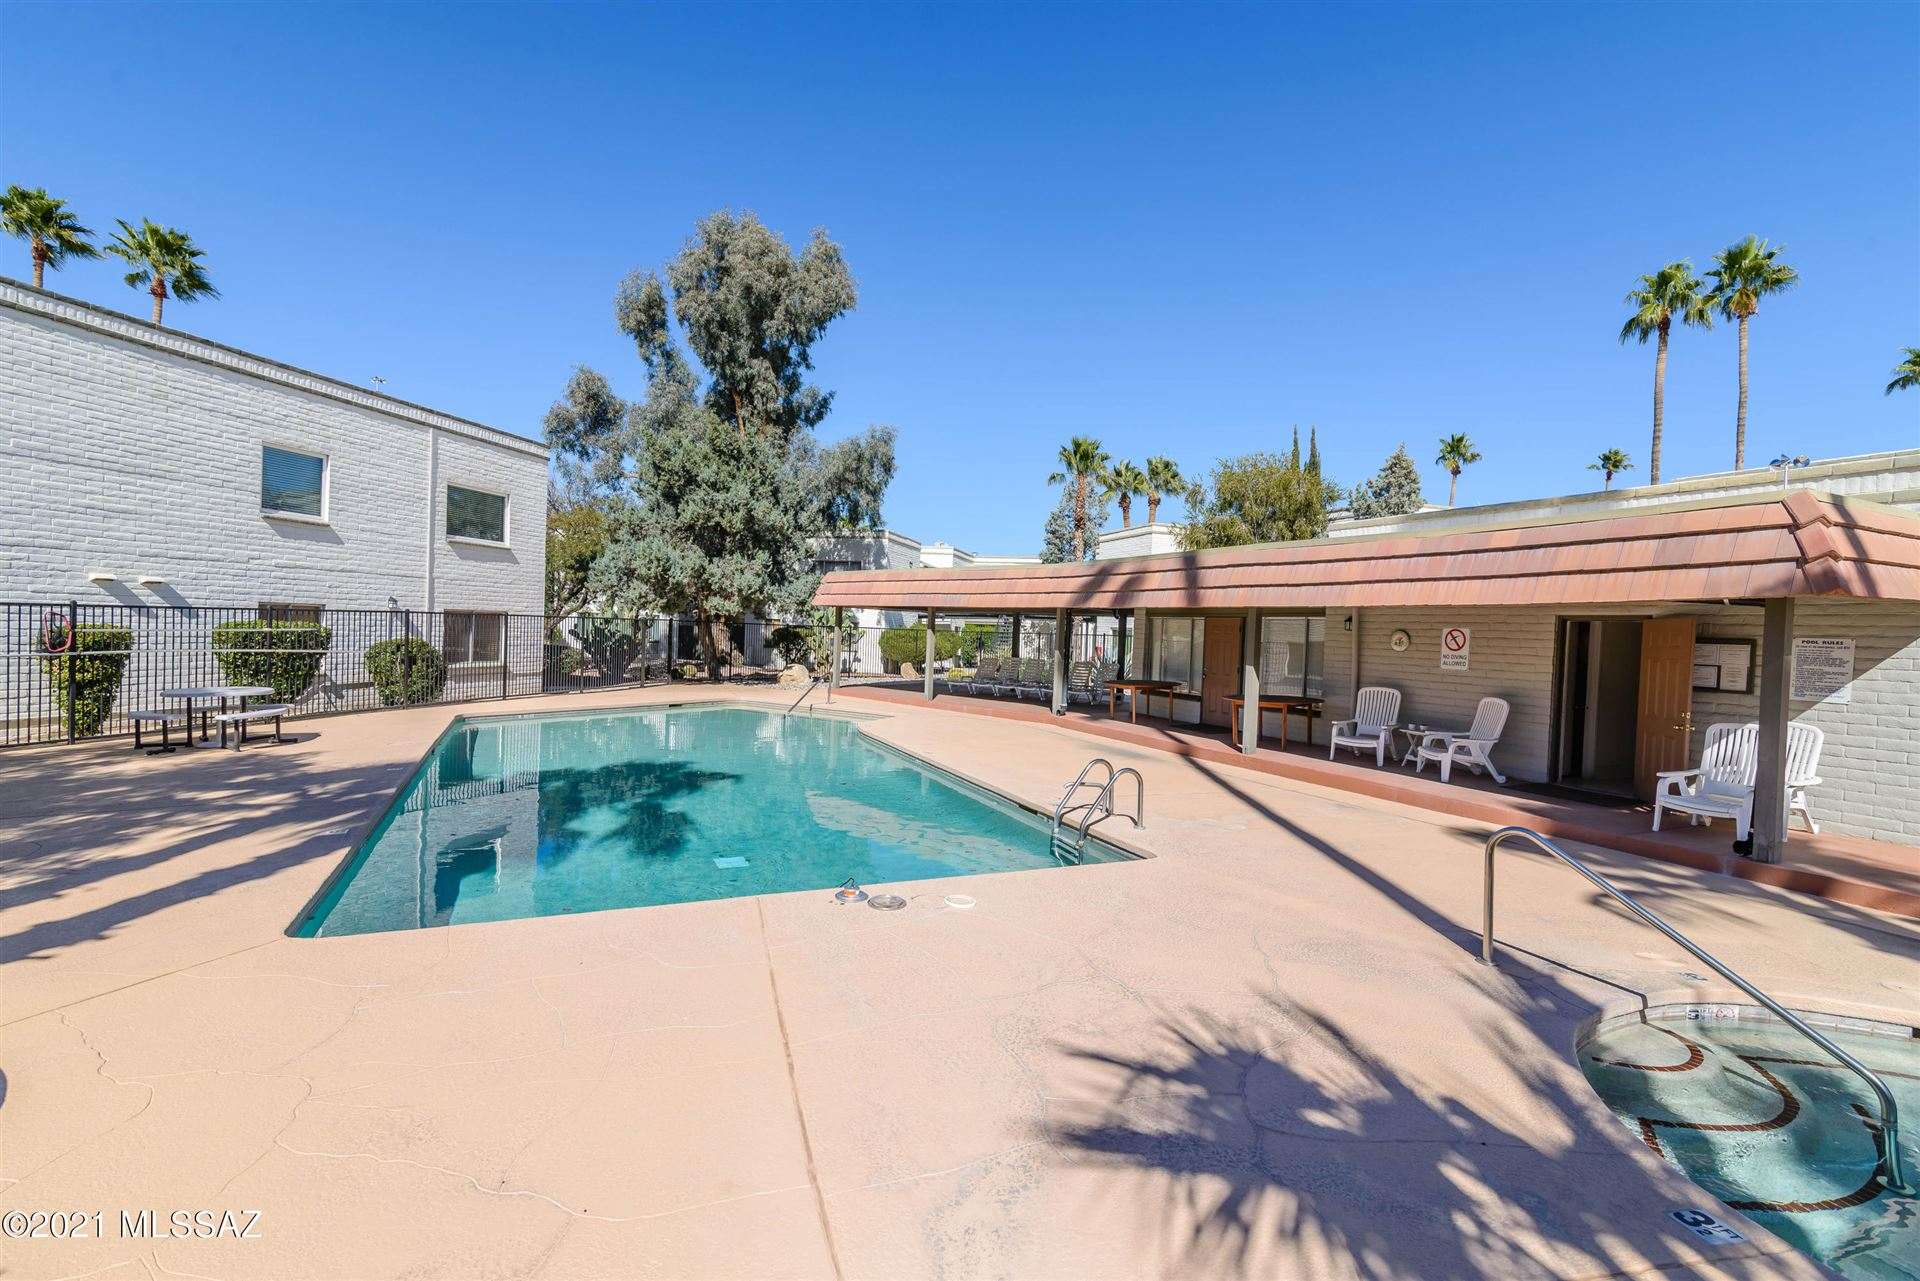 8450 E Old Spanish Trail #249, Tucson, AZ 85710 - MLS#: 22103105